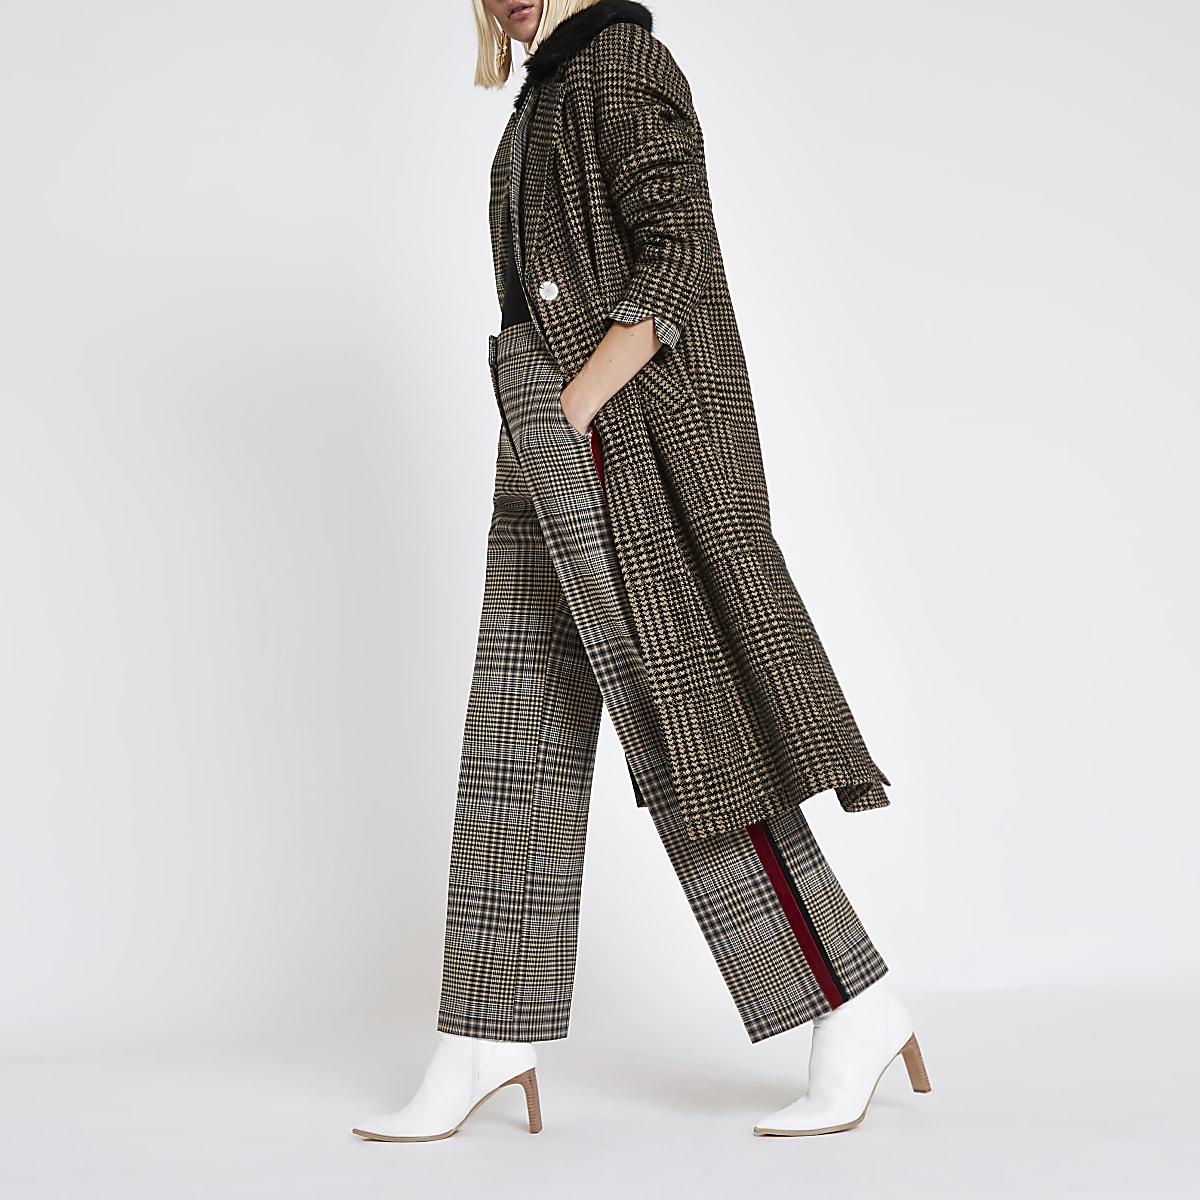 Brown check faux fur knit coat